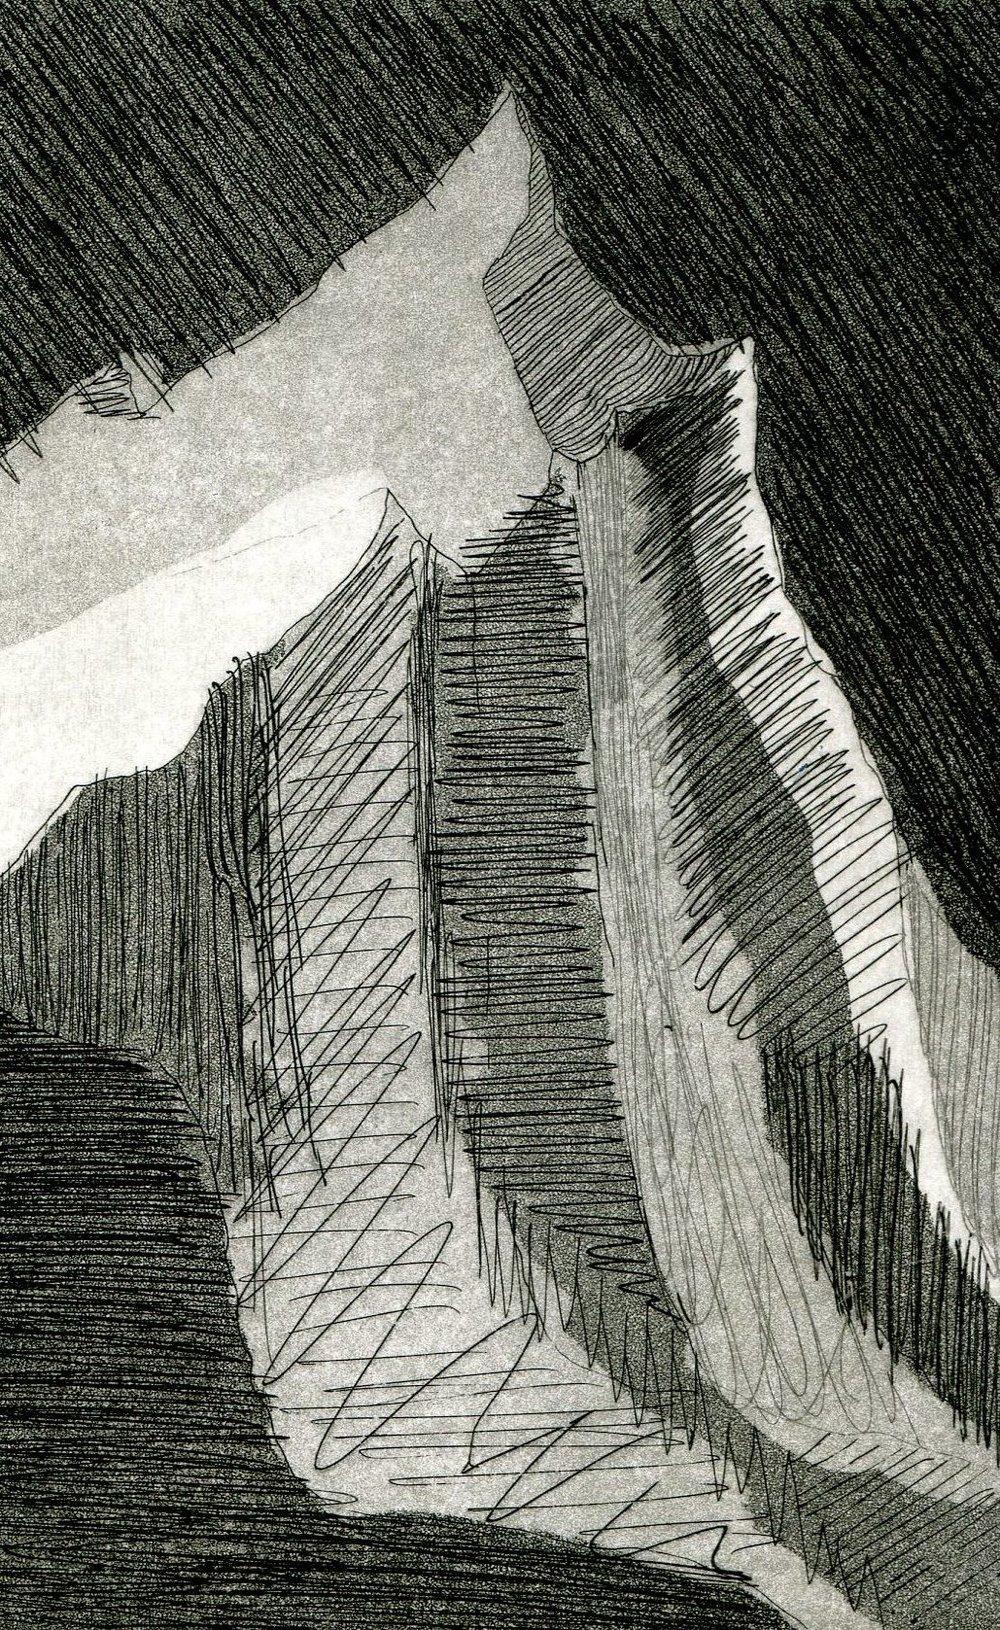 96b Eloff Pretorius, Molar 3, Etching on paper